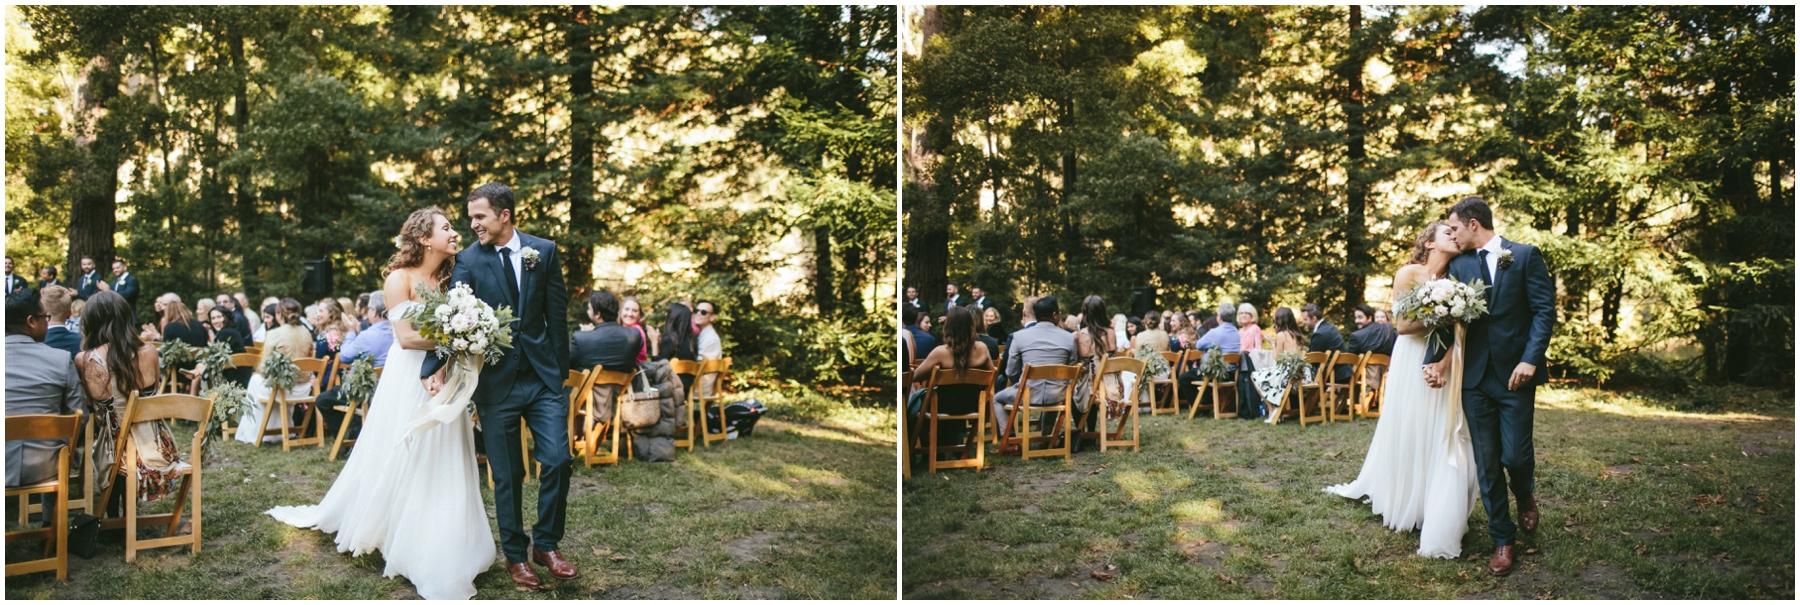 Emily+Paul-WEDDING_KellyBoitanoPhotography_0098